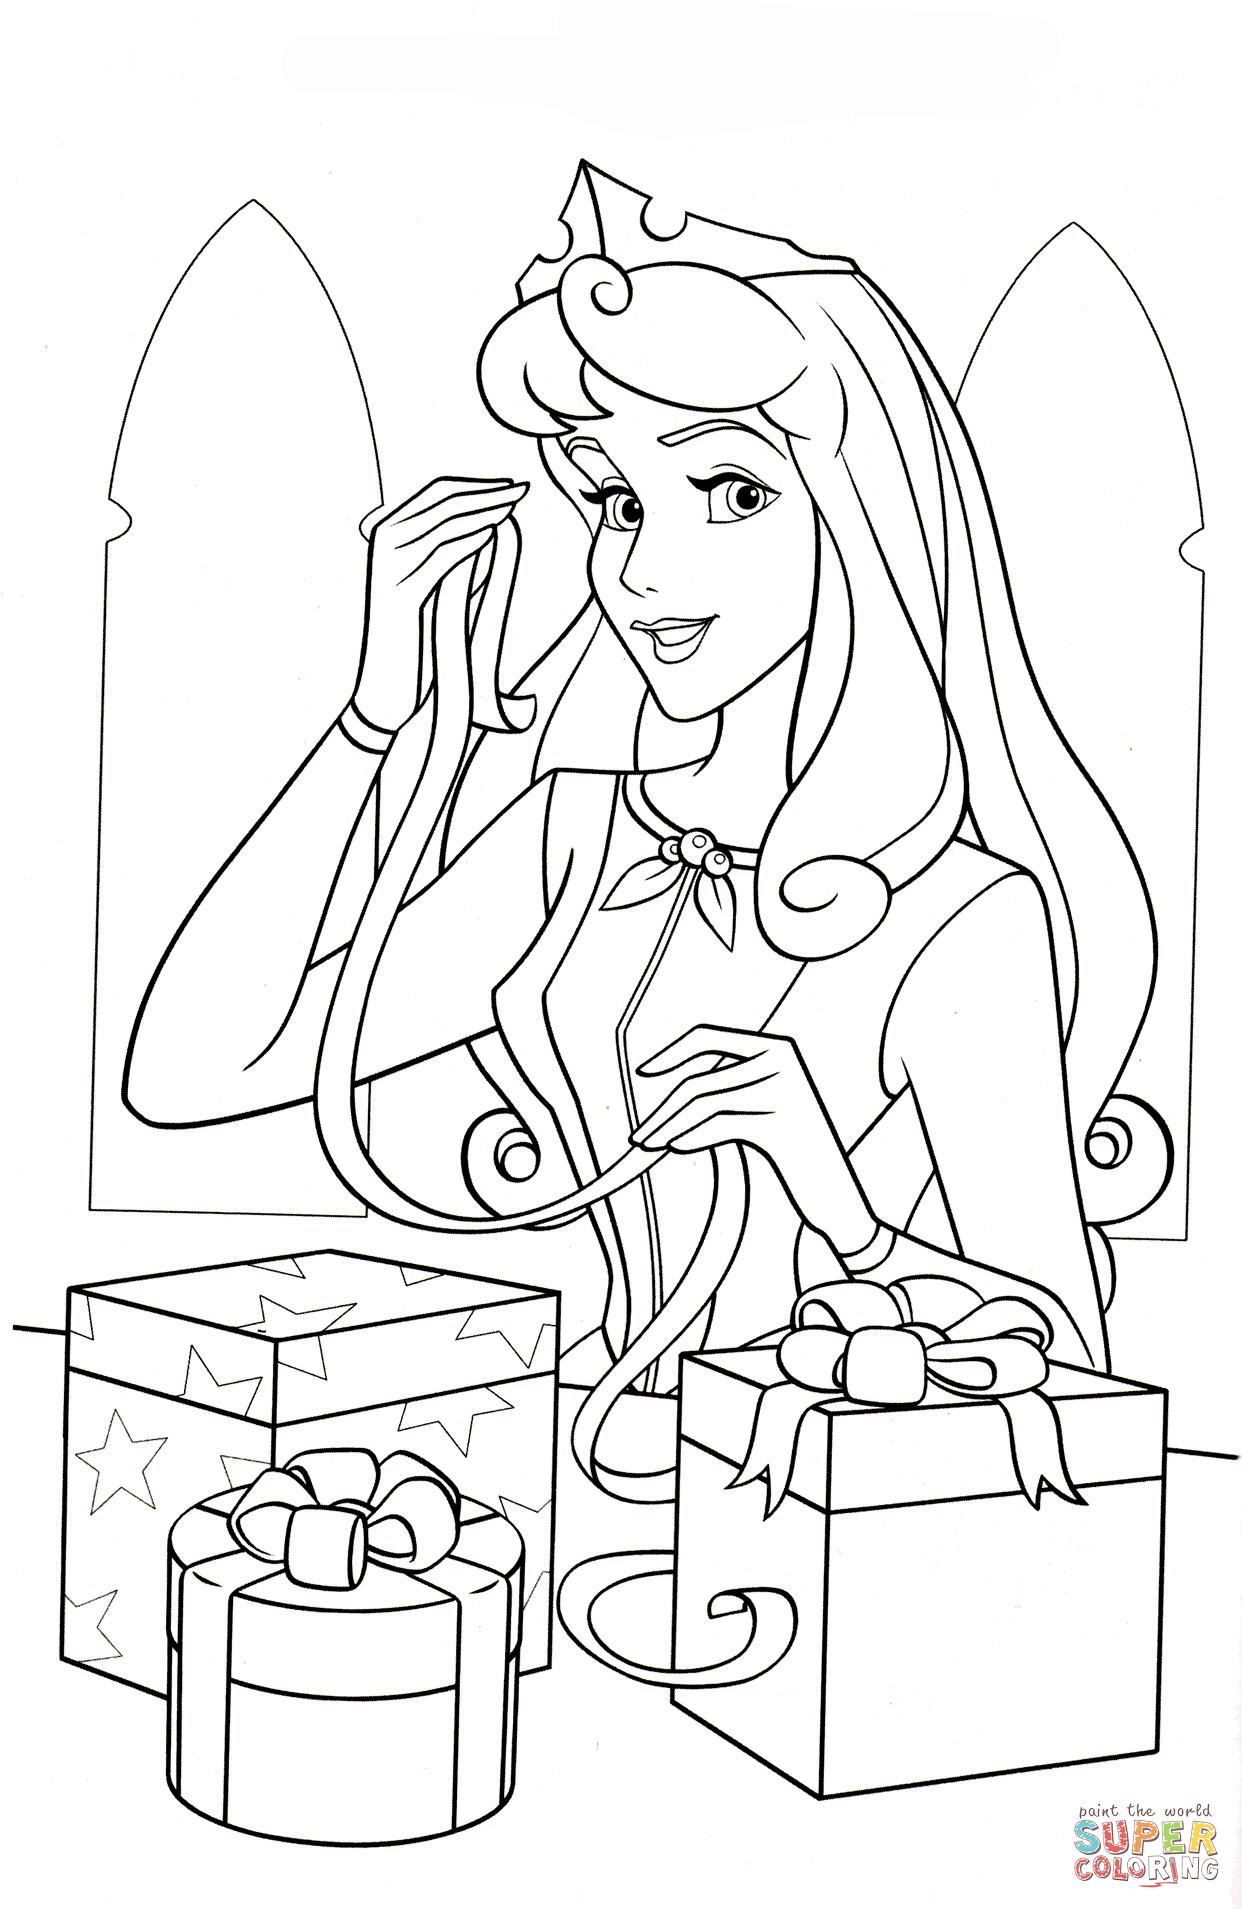 Princess Aurora Coloring Pages Free Princess Aurora Loves Christmas Coloring Page Free Printable